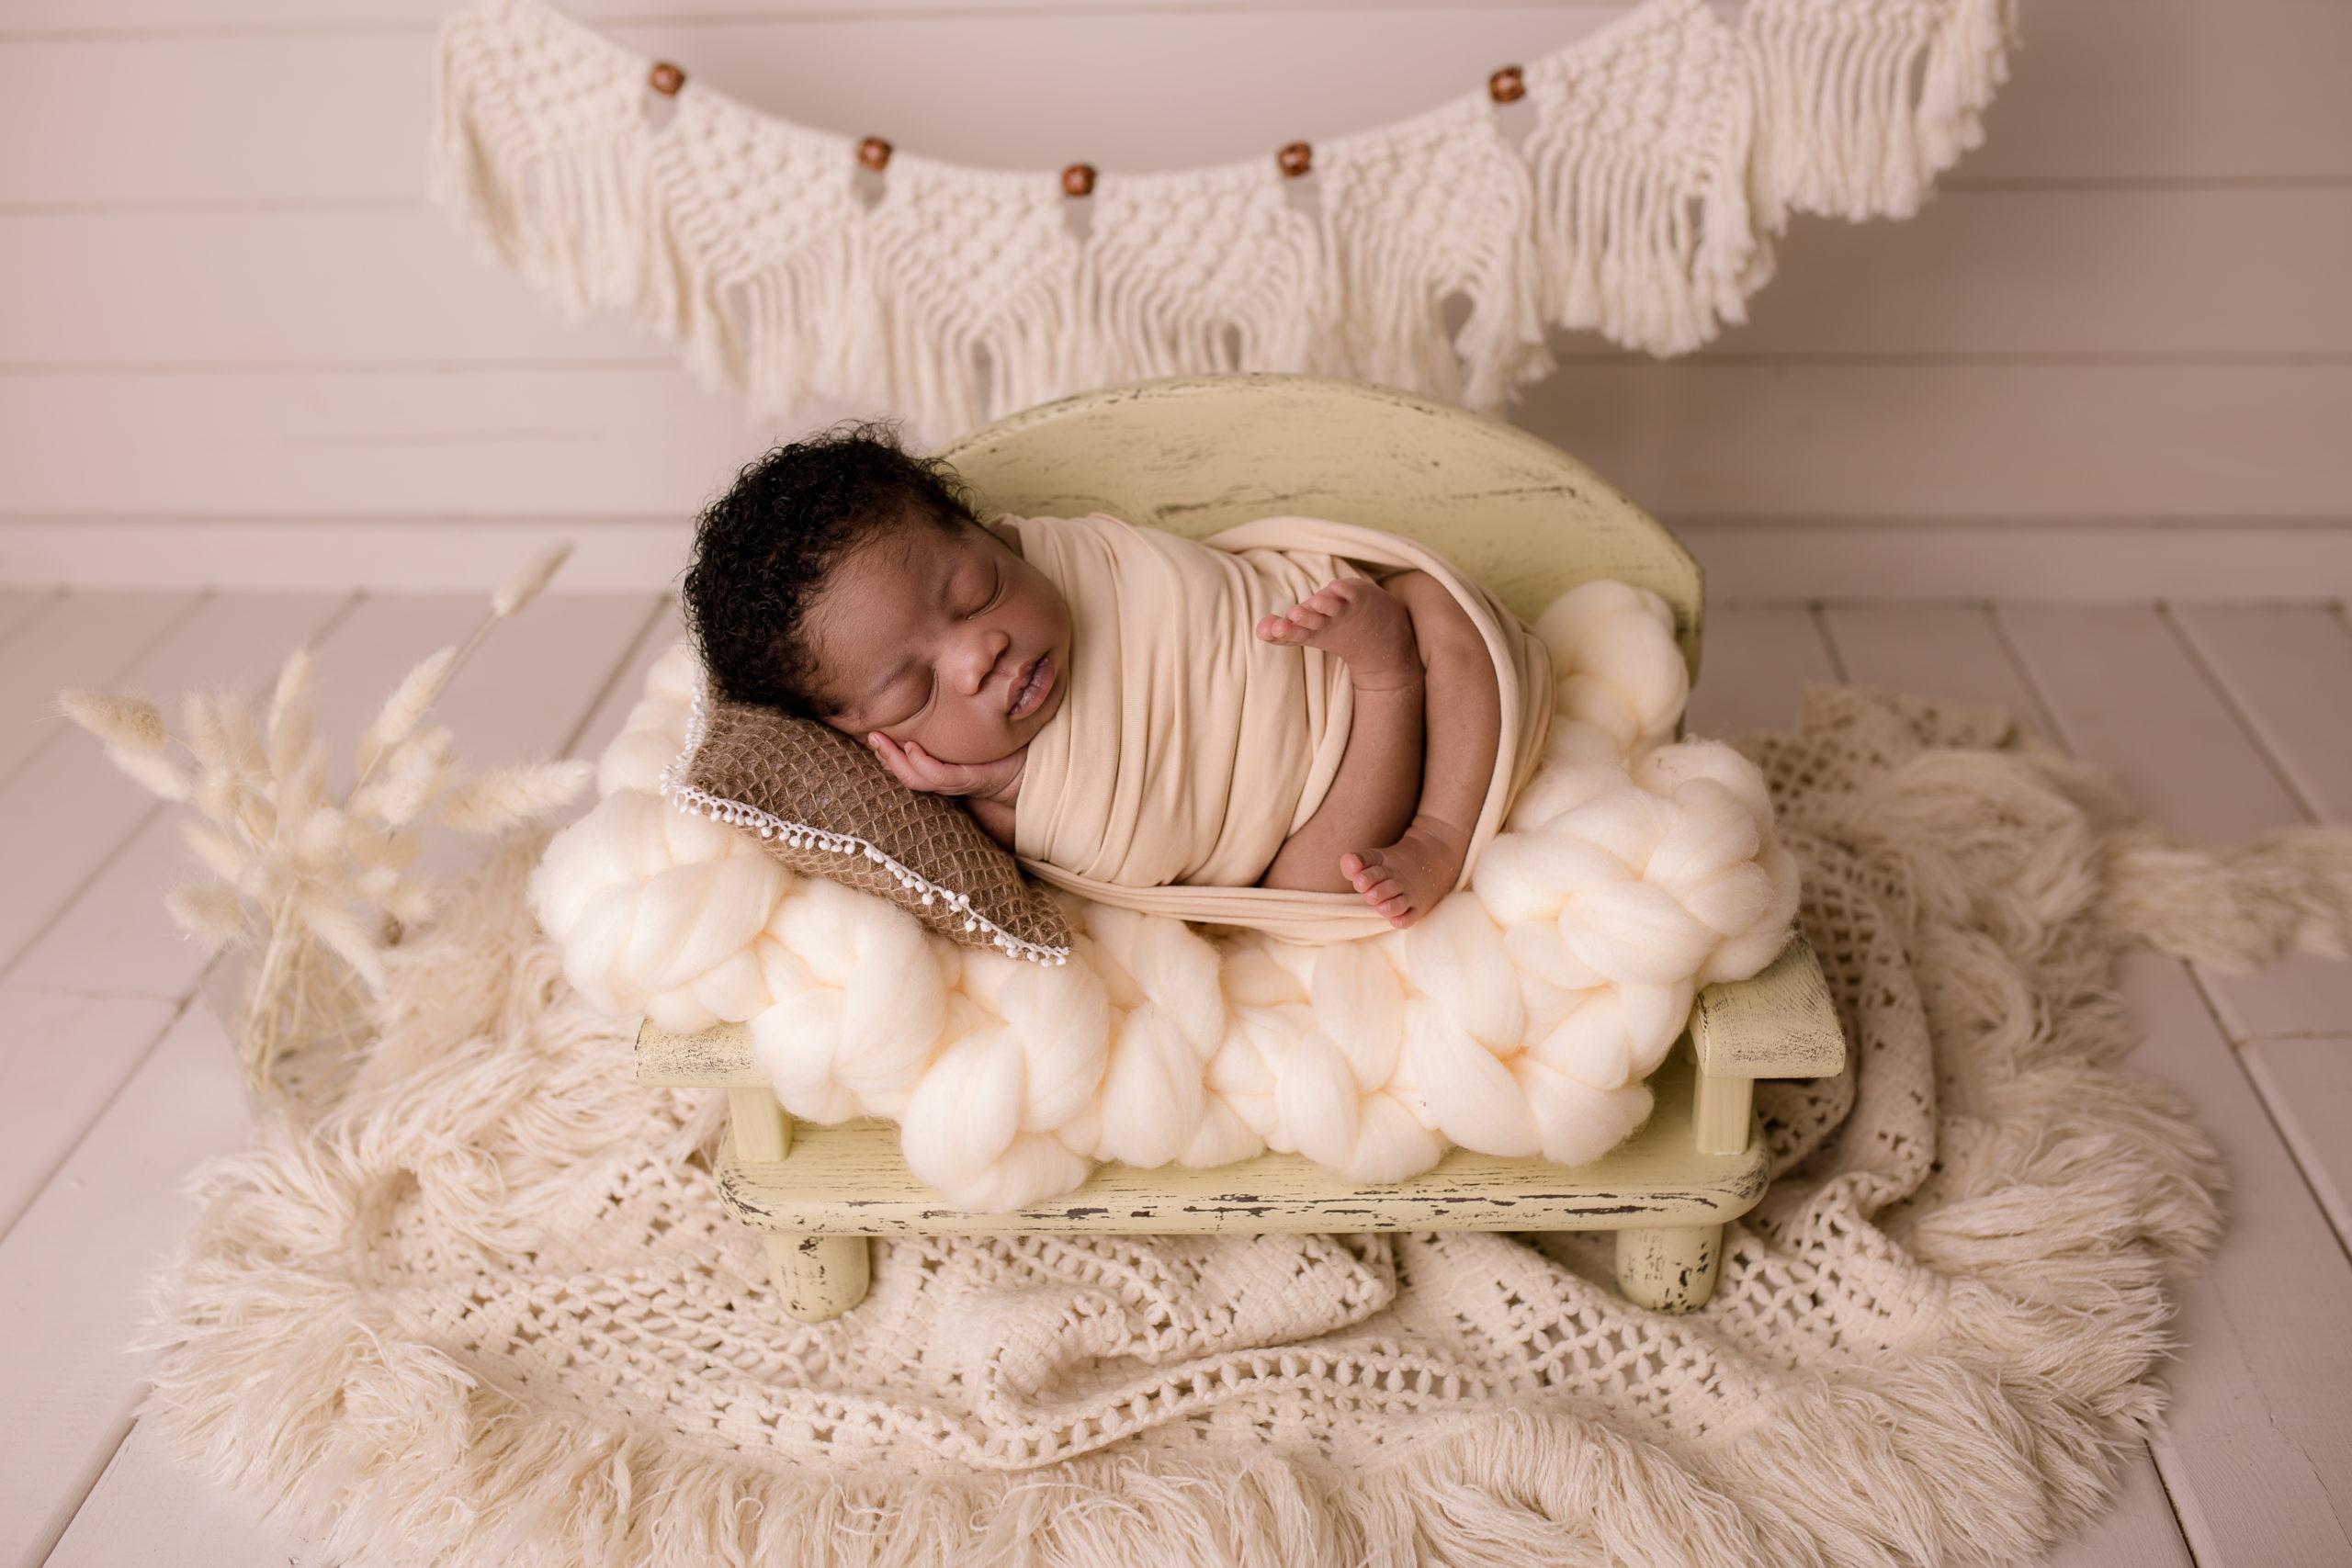 baby photoshoot newborn photo studio near Kington South West London